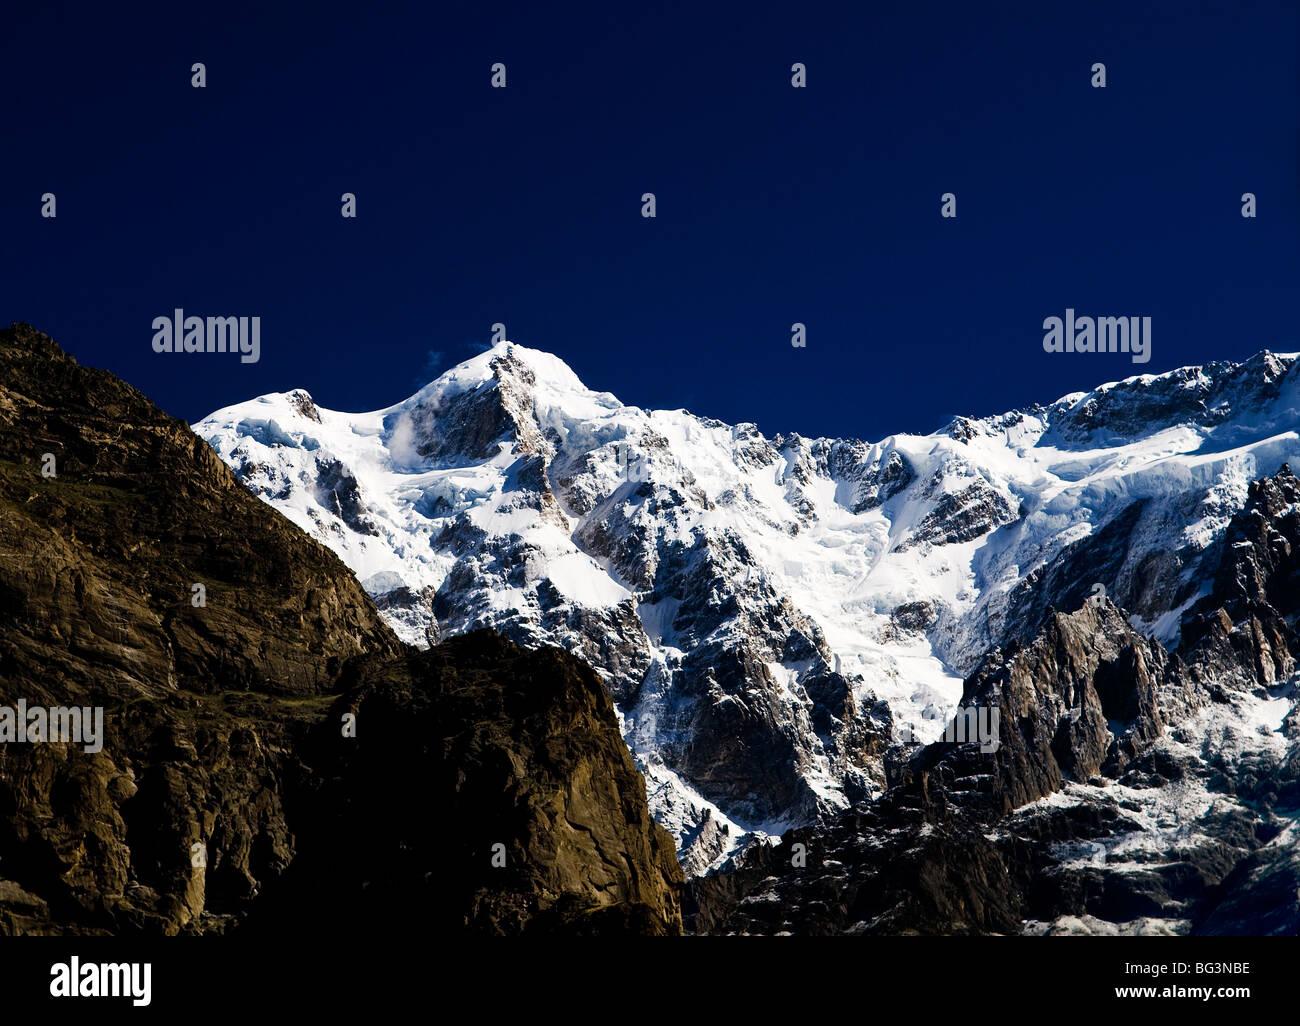 Dramatic mountain scenery as seen in North Pakistan. - Stock Image